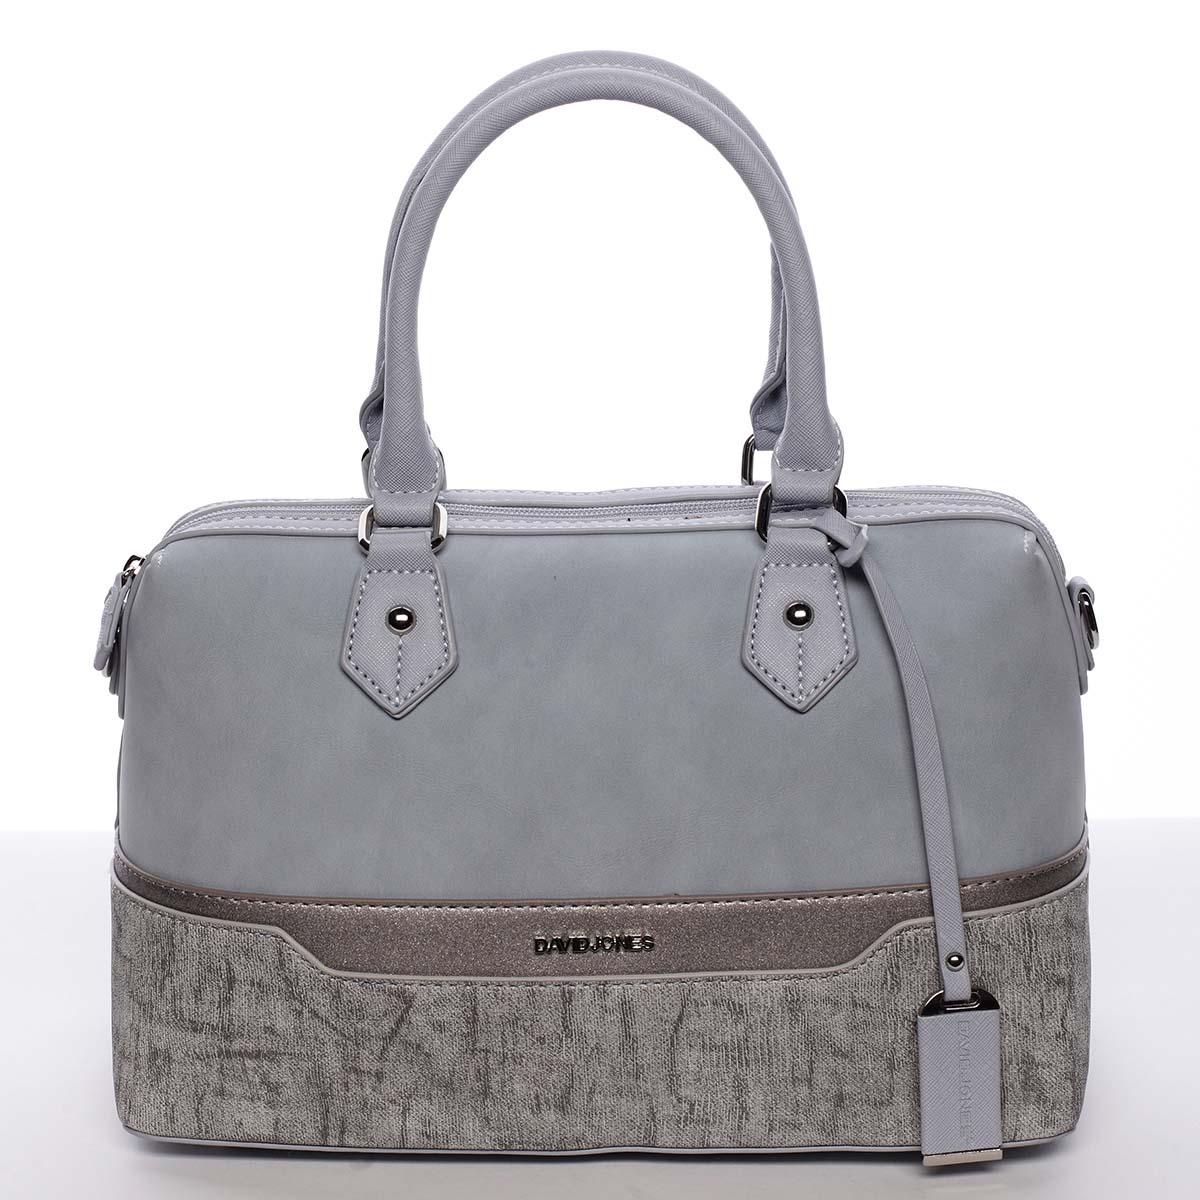 Elegantná a módna svetlomodrá dámska kabelka do ruky - David Jones Lizz